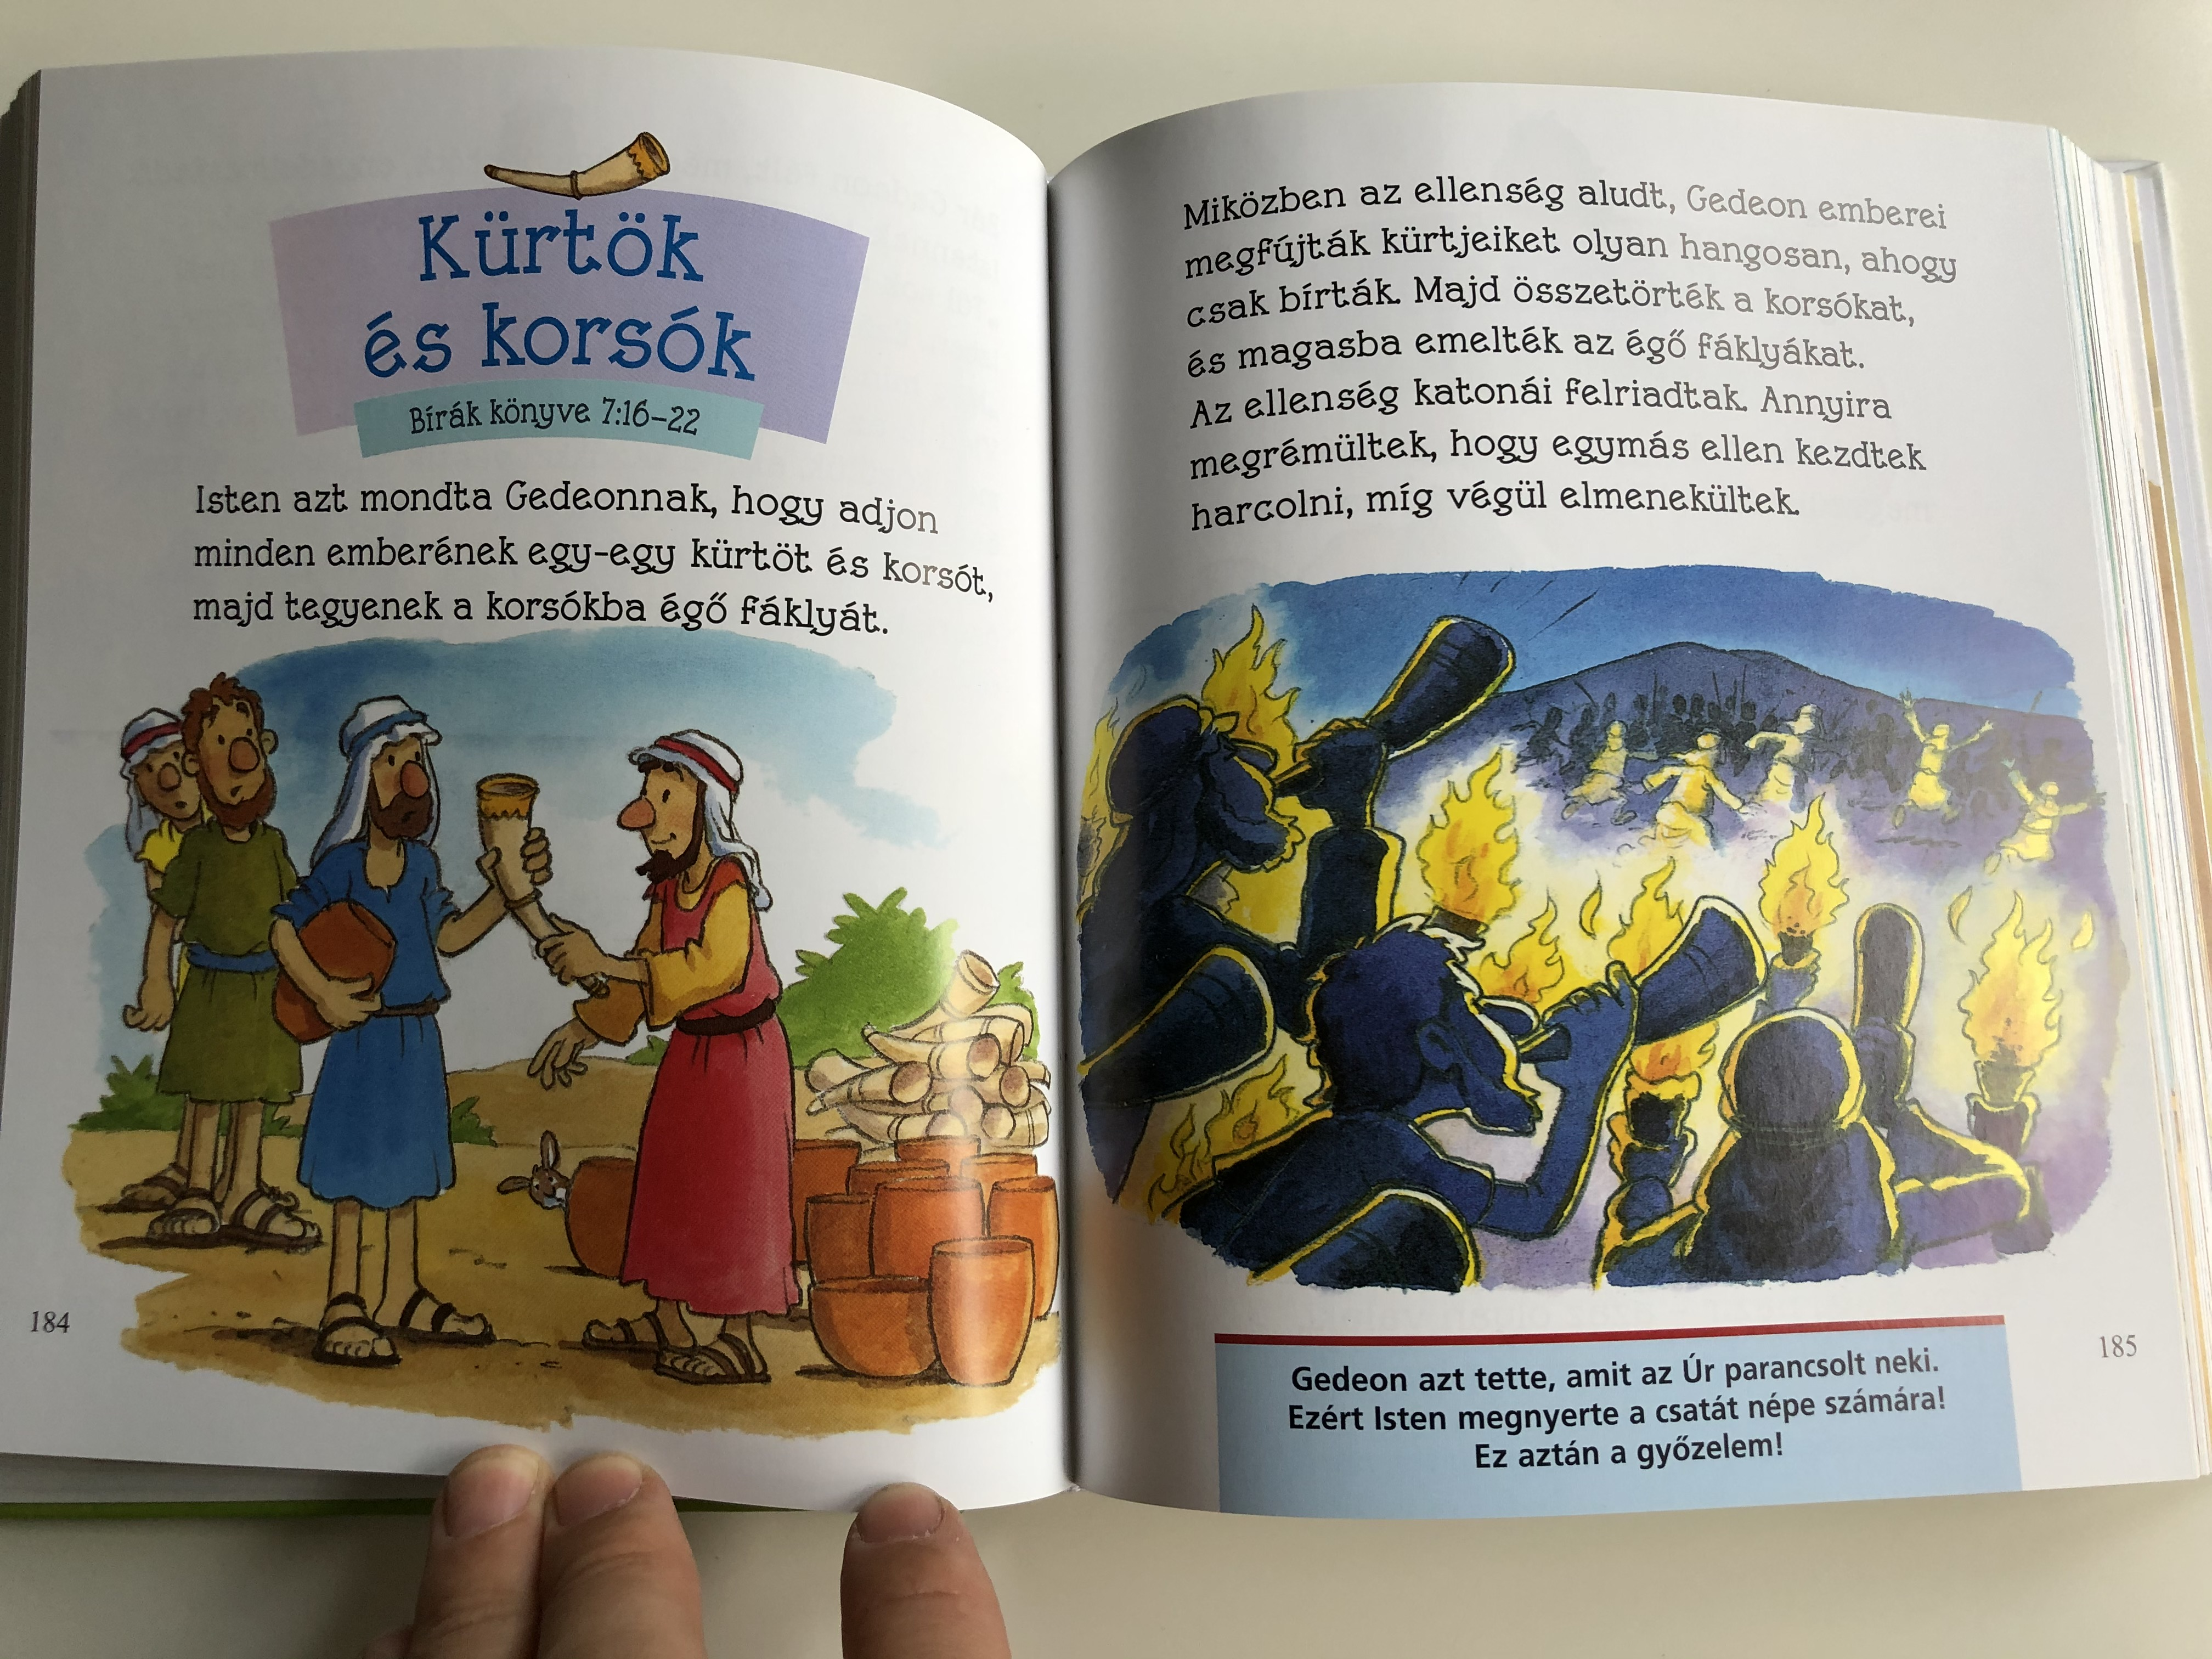 gyerekek-bibli-ja-hungarian-edition-of-read-share-bible-by-gwen-ellis-12.jpg